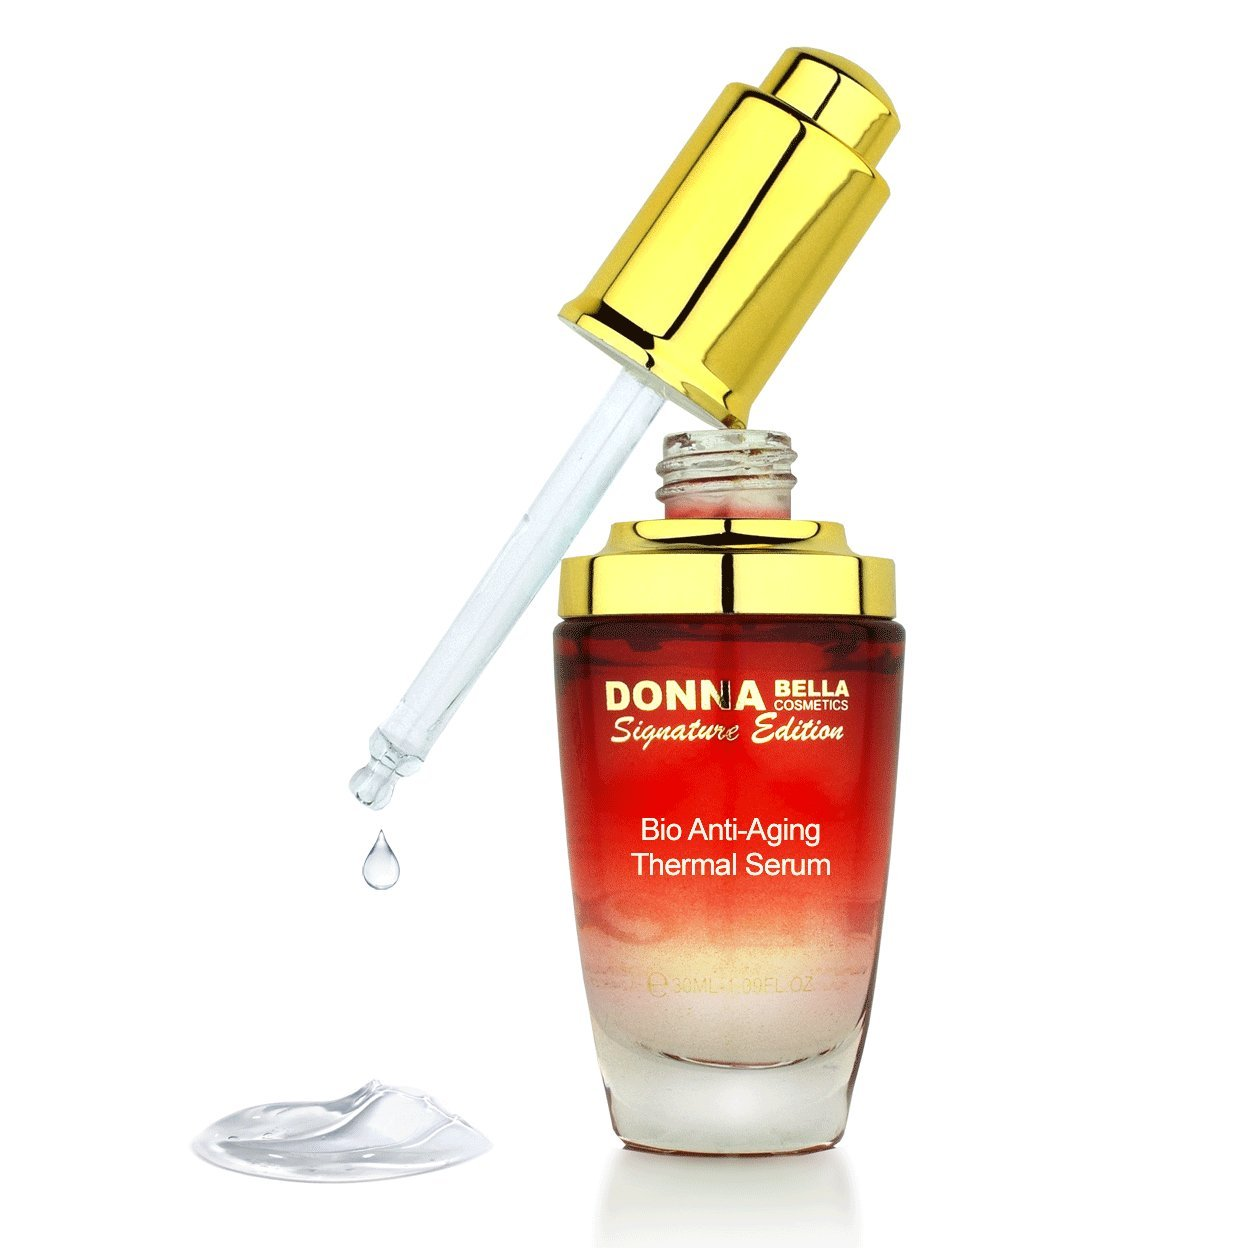 Bio Anti Aging Thermal Serum Beauty Stemcell Biogold